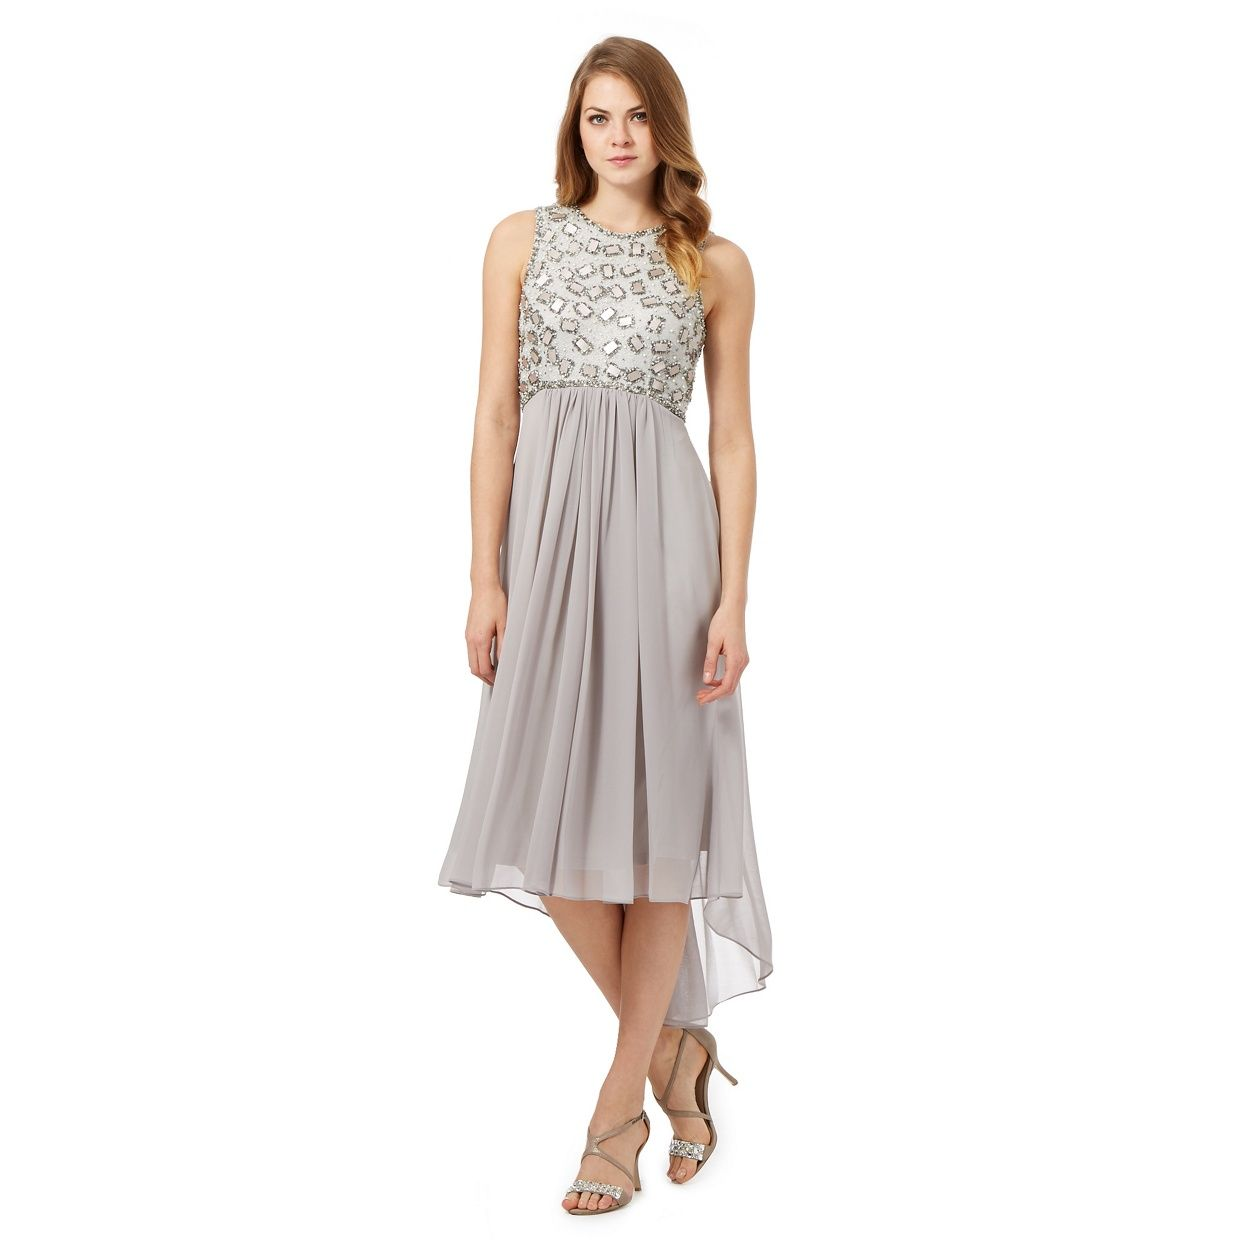 No. 1 Jenny Packham Silver \'Calista\' hand-embellished dress ...